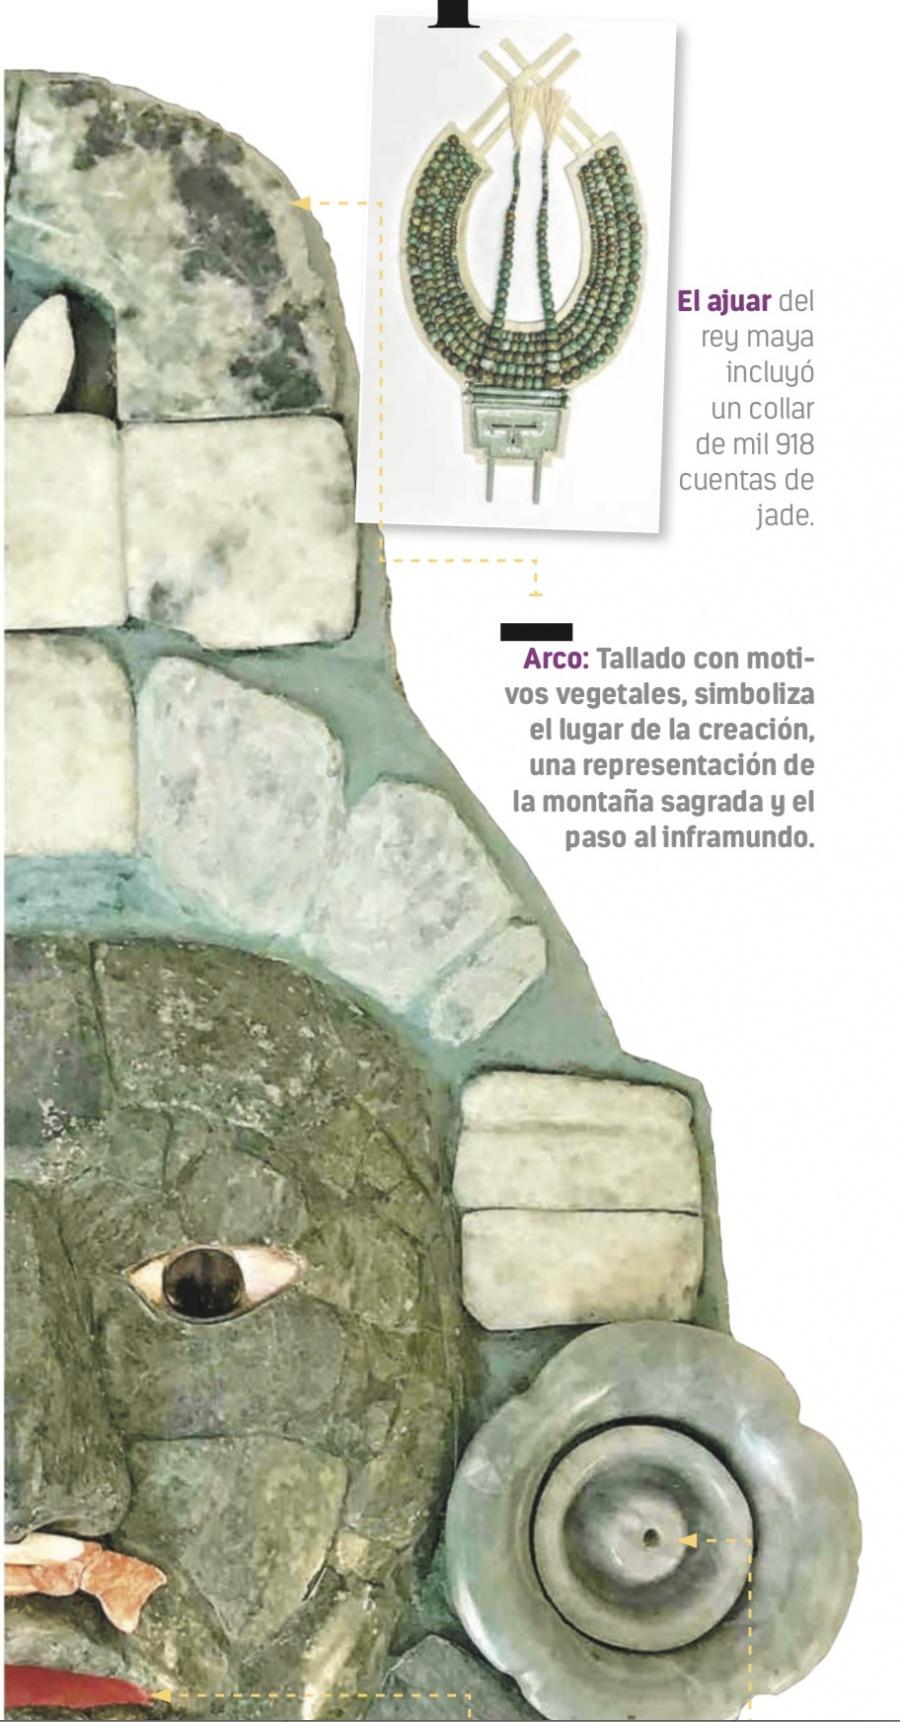 Réplica de la máscara de Calakmul impacta en España